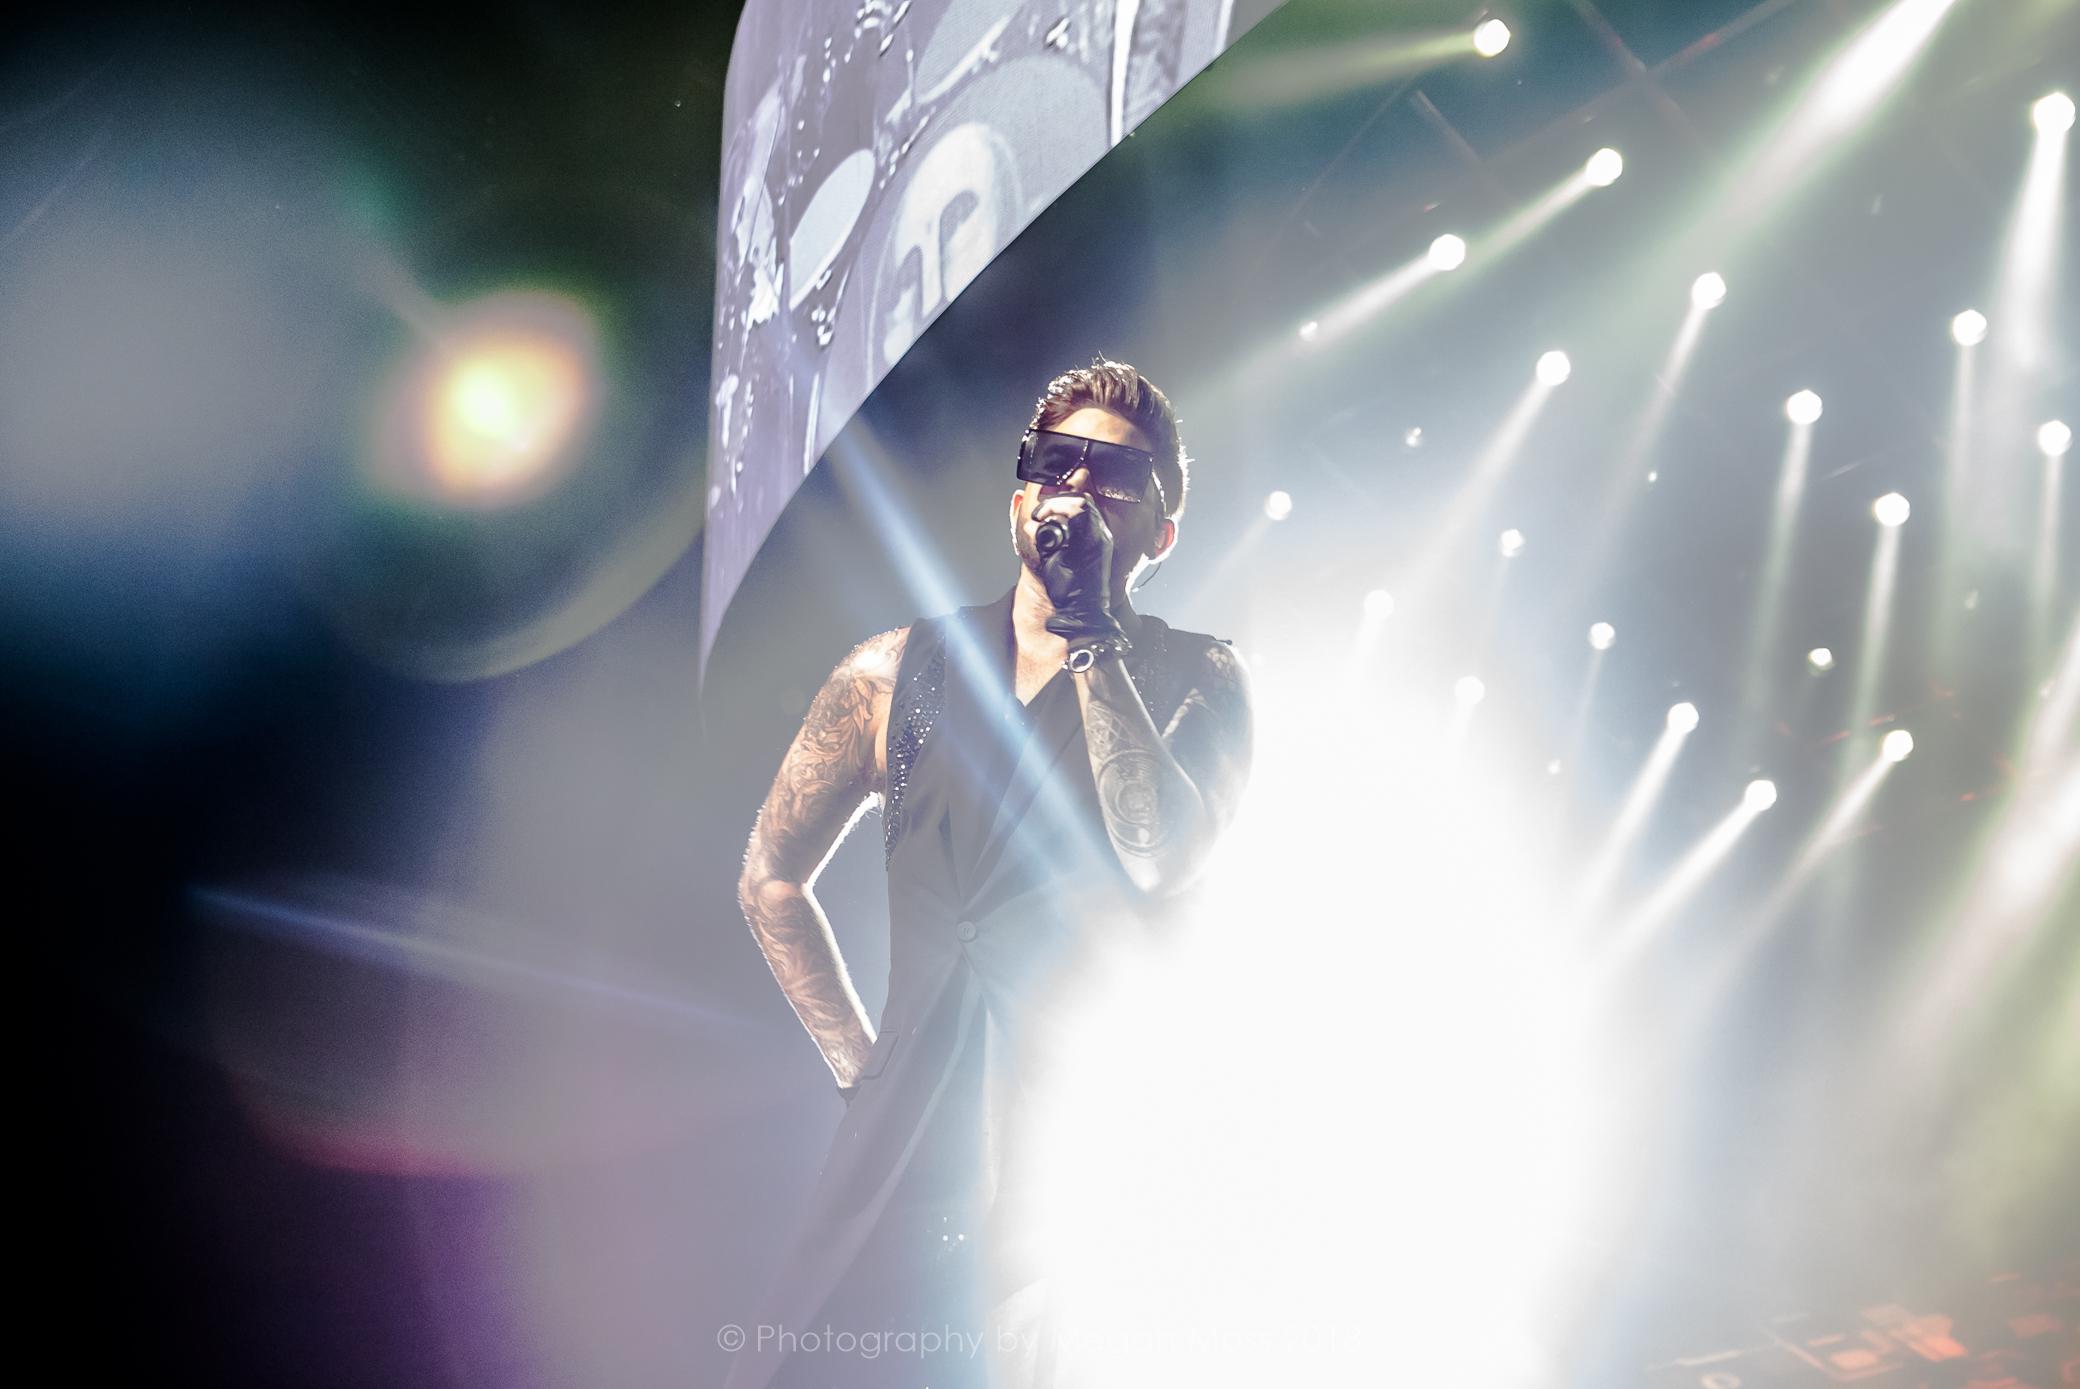 Queen+Adam Lambert-9390.jpg